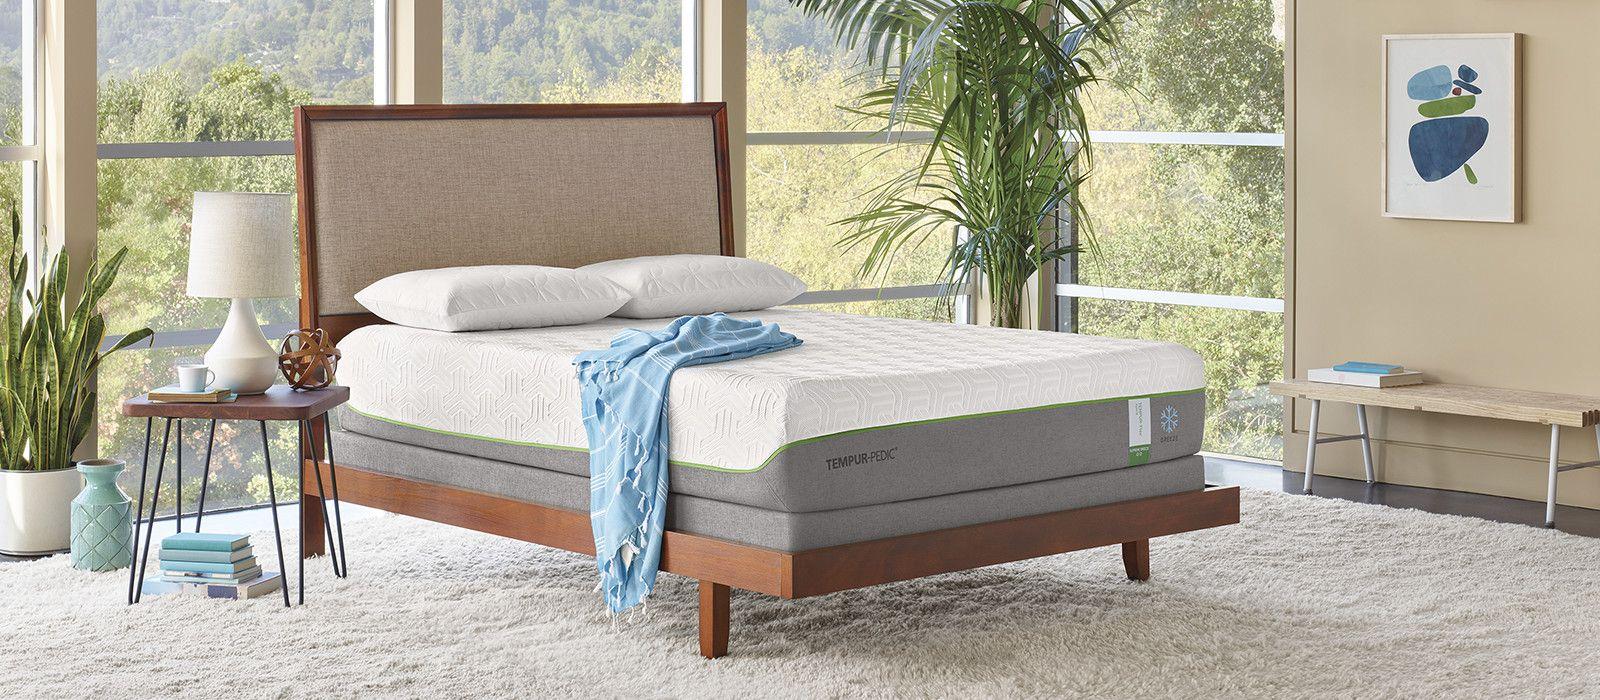 TEMPURAdapt® Tempurpedic mattress, Dining room style